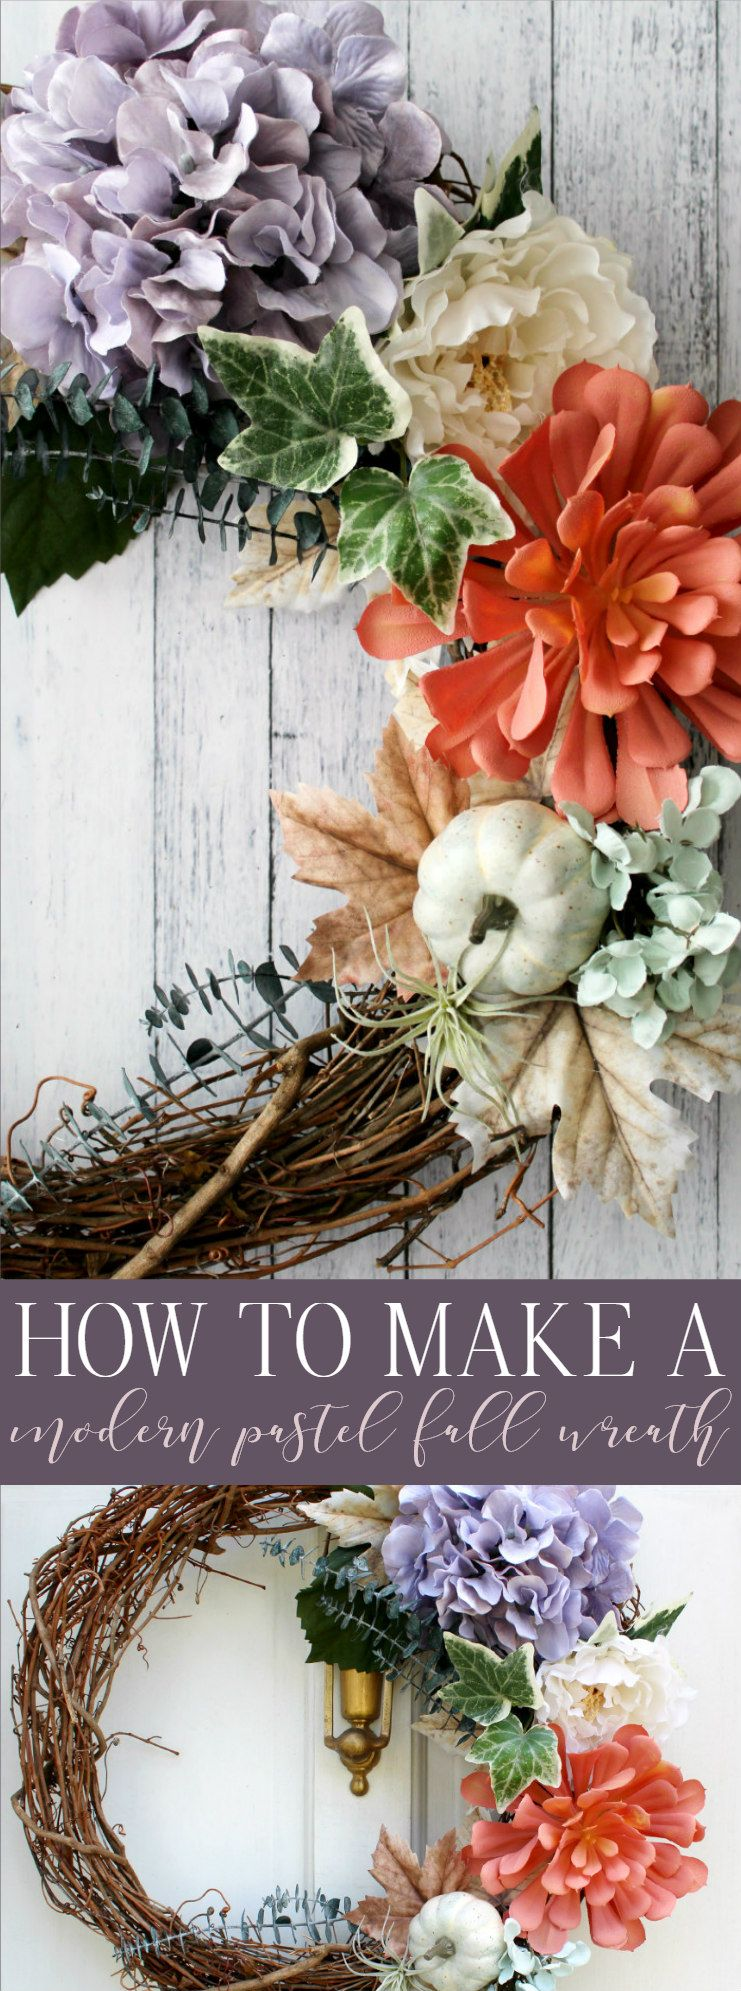 How to Make a Modern Pastel Fall Wreath | Fall wreath ...